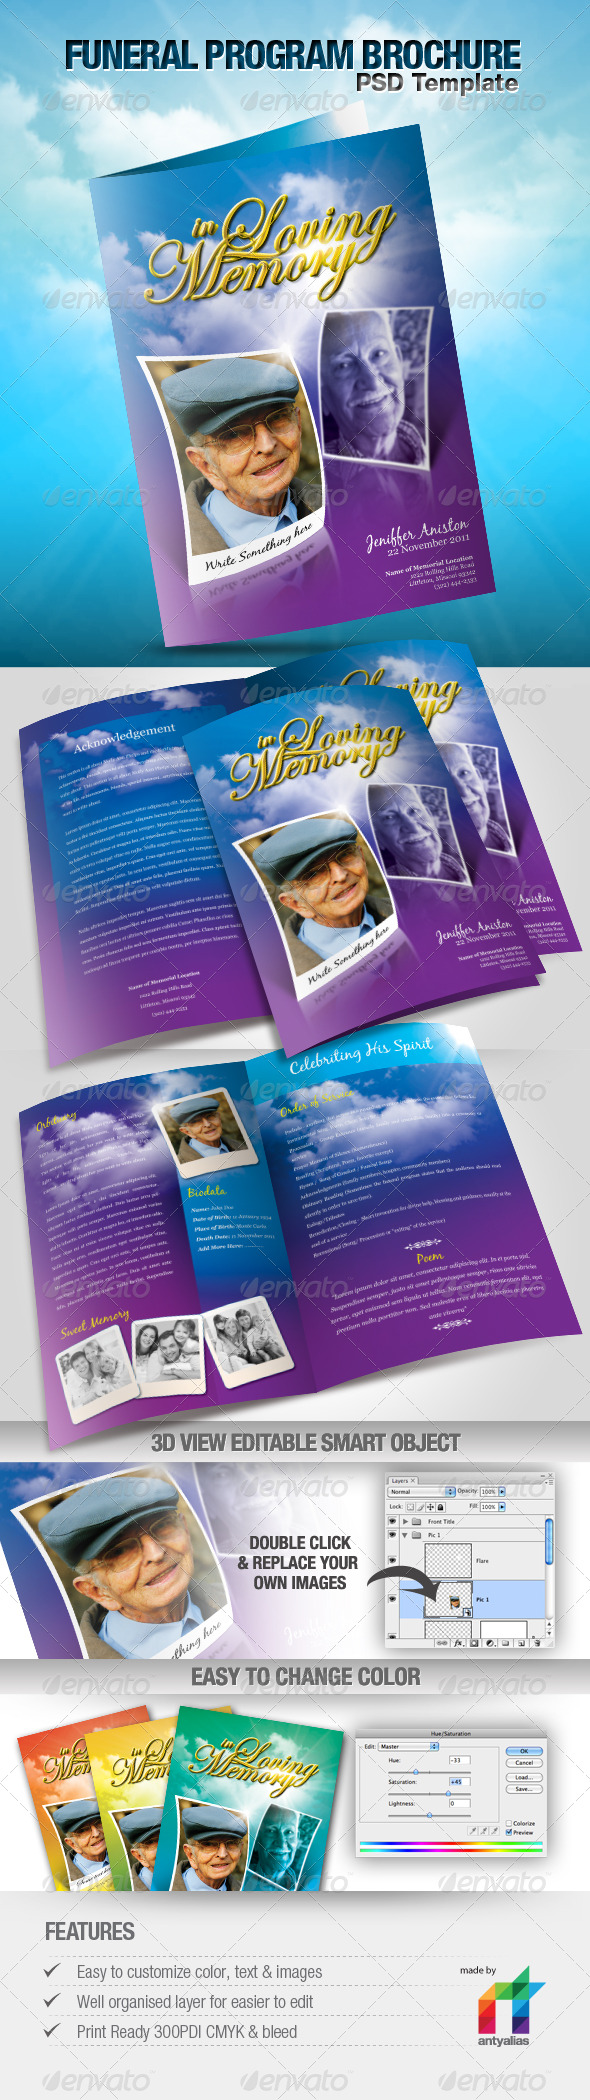 funeral program brochure template cash money pinterest funeral